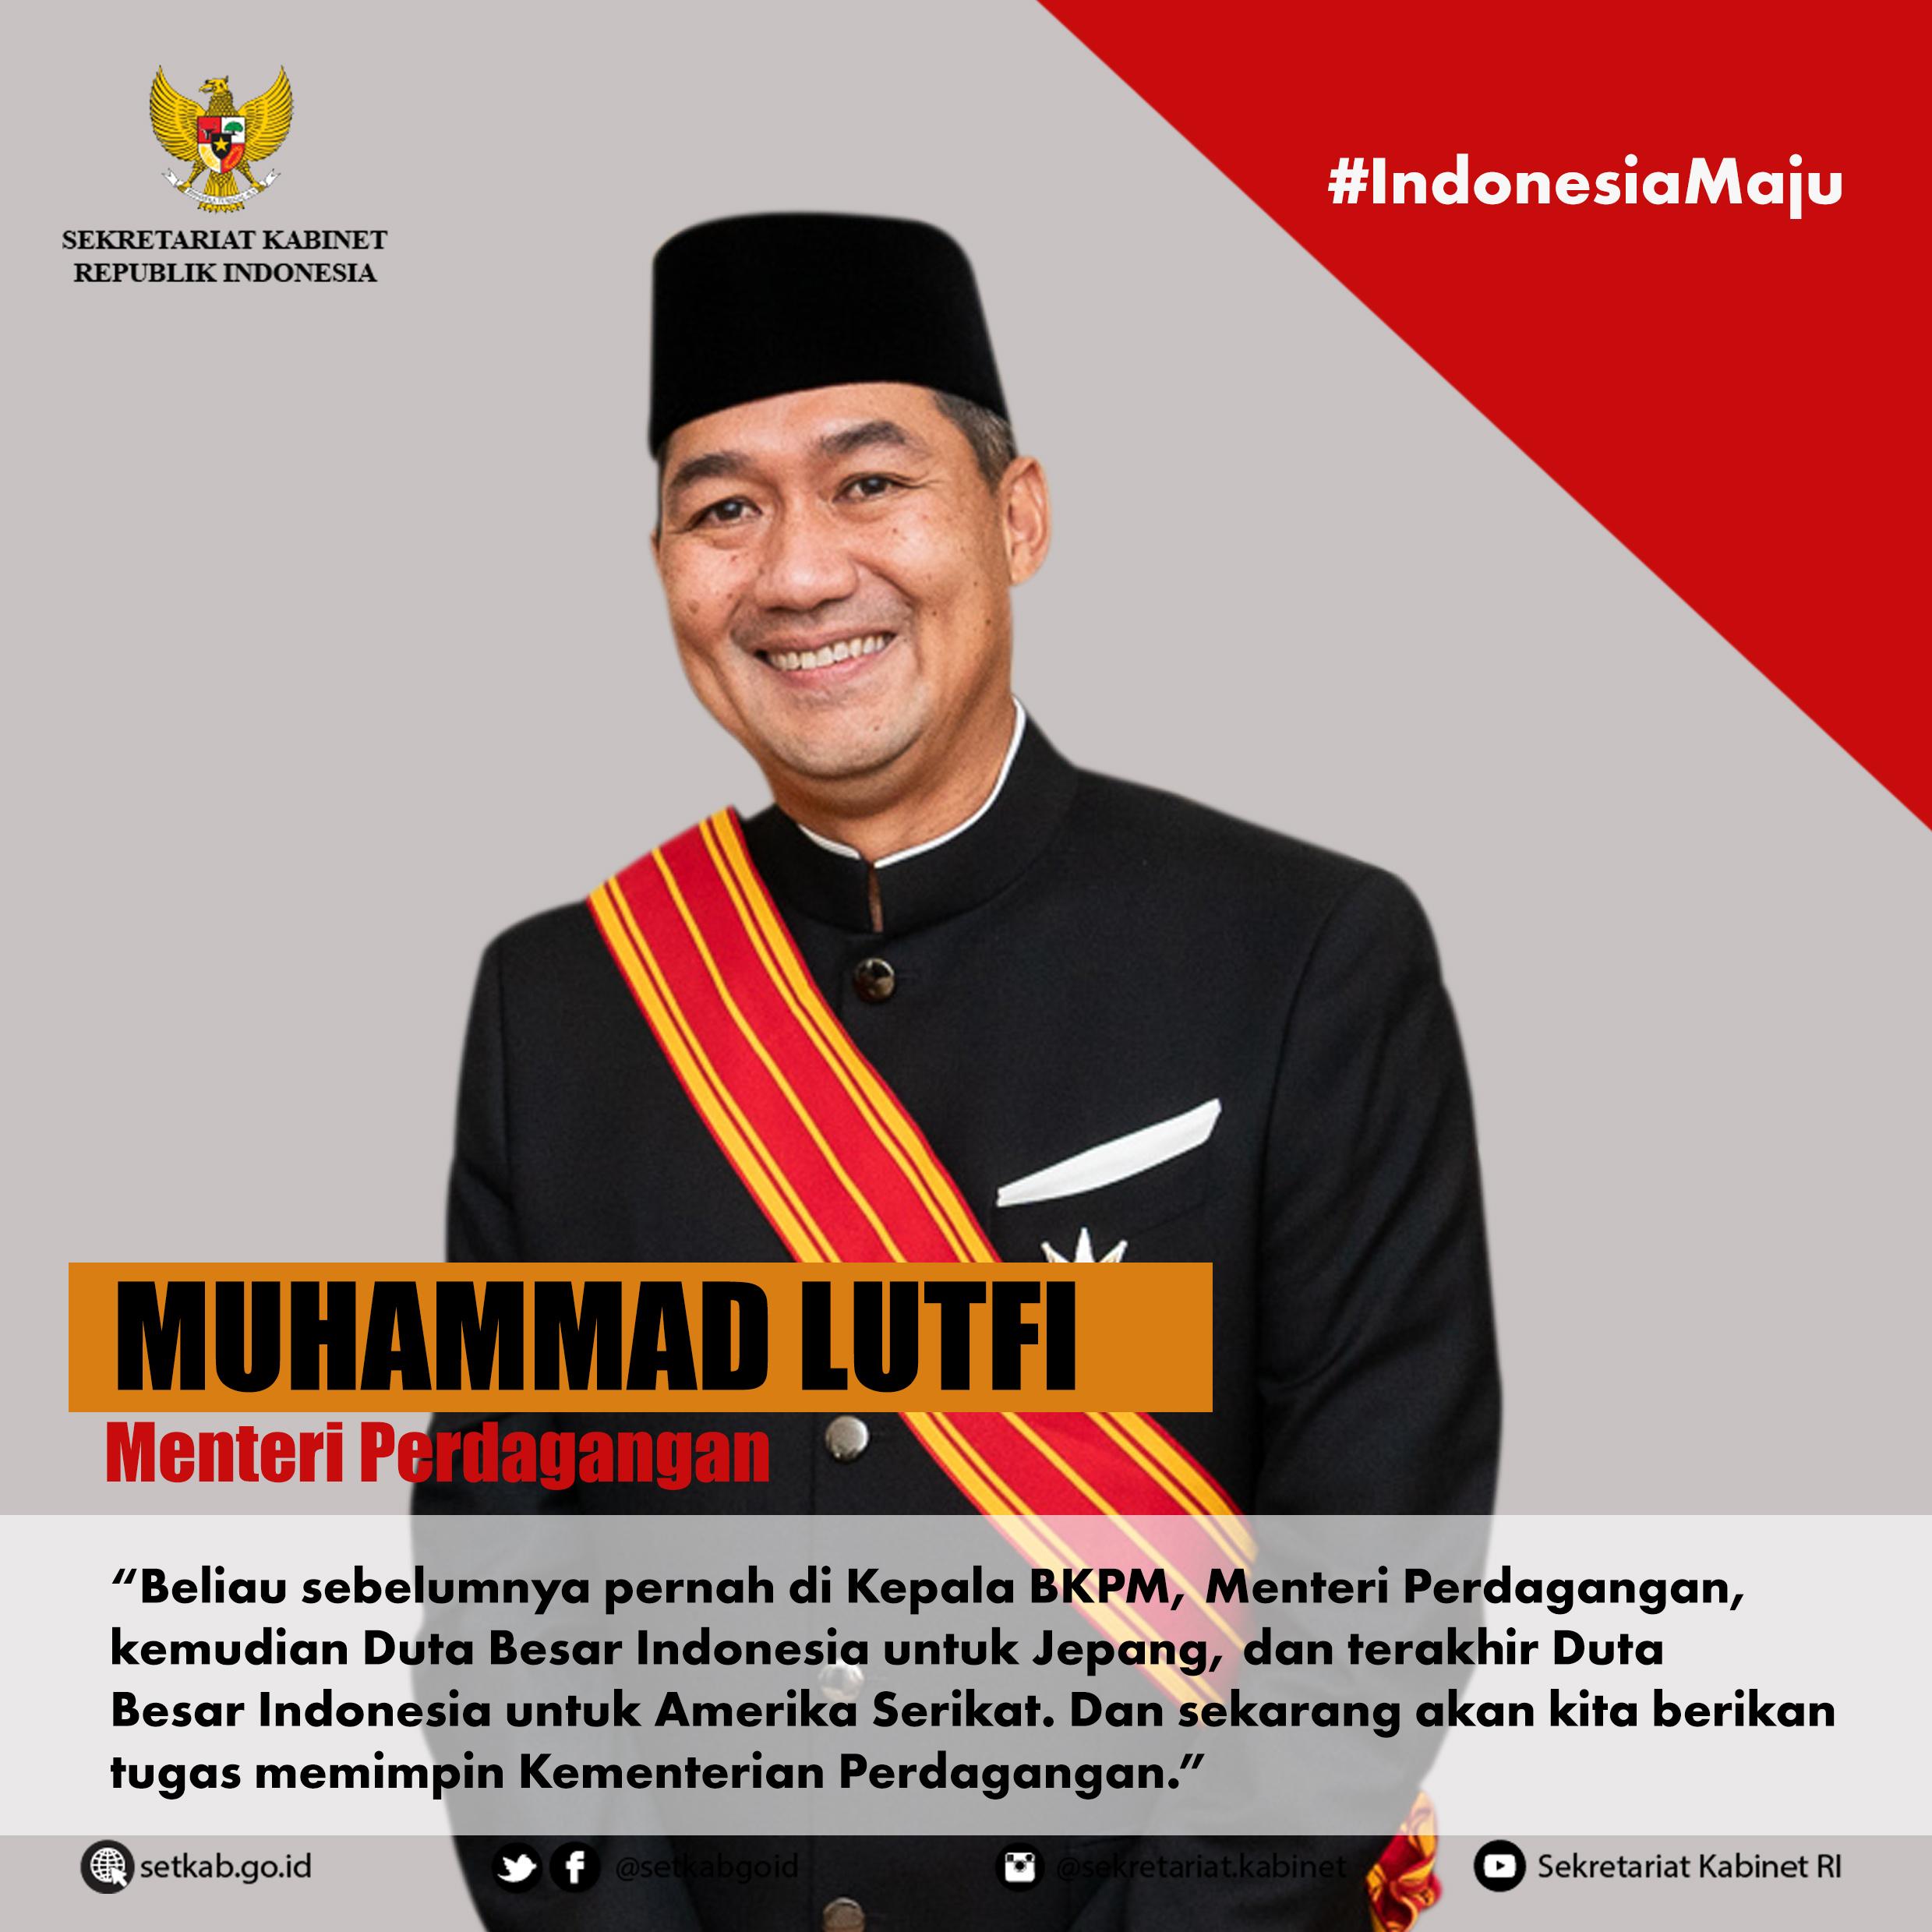 Profil Menteri Kabinet Indonesia Maju yang Dilantik pada Rabu (23/12/2020)